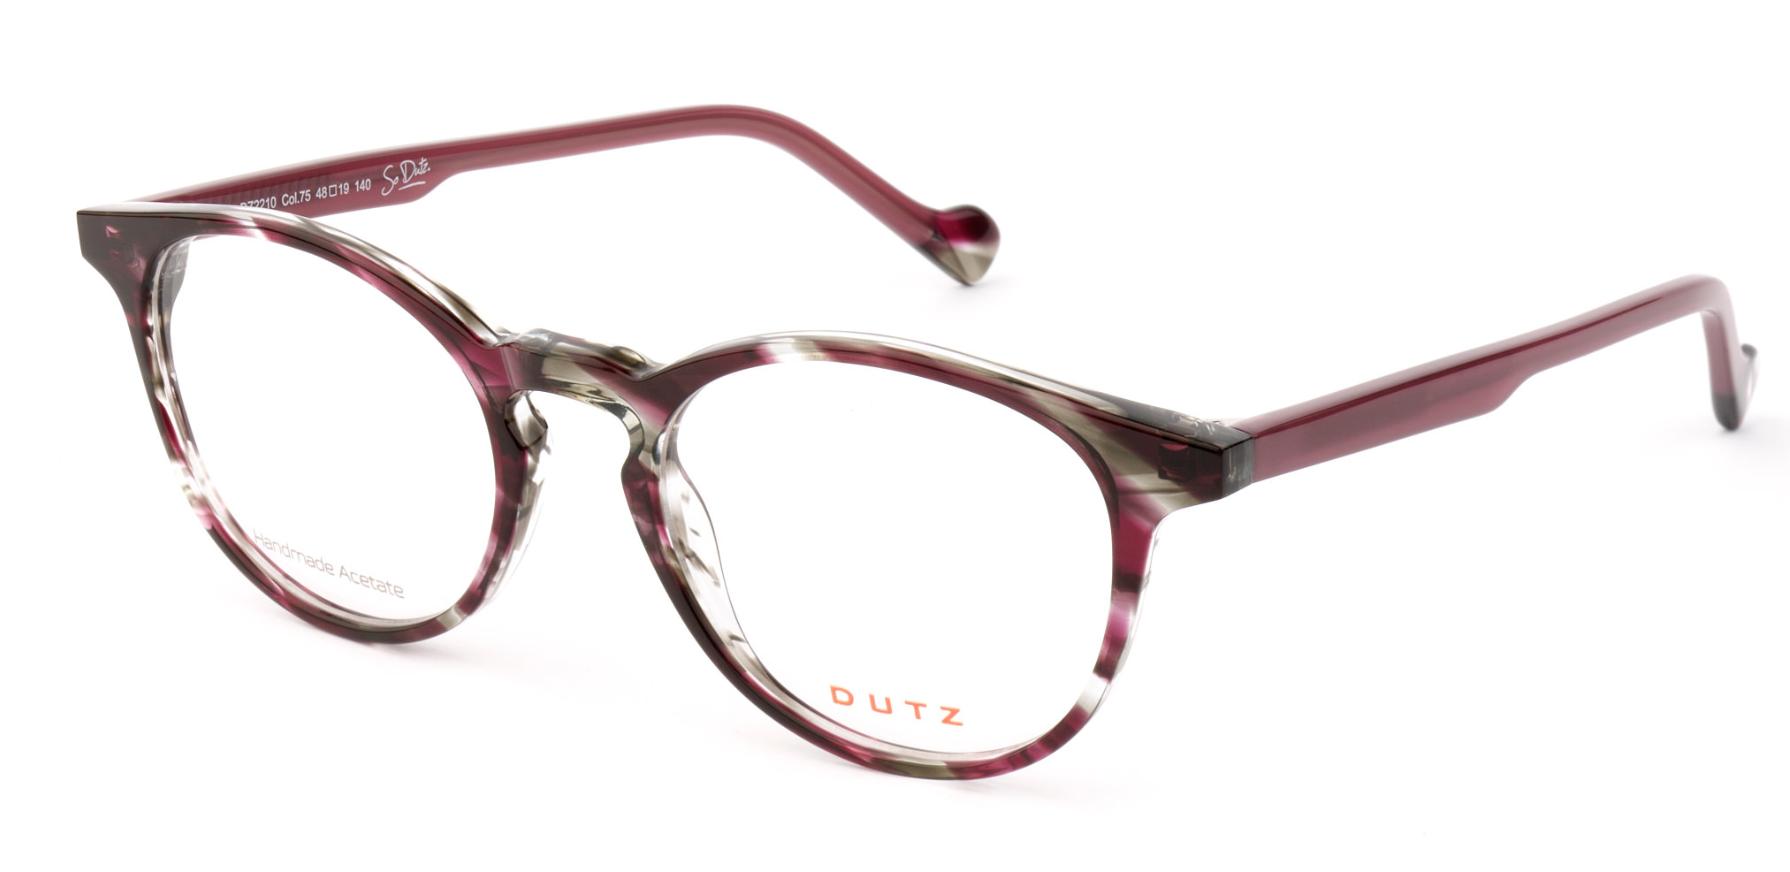 502c9c6889 Dutz Eyewear at Optical Innovations KC 2